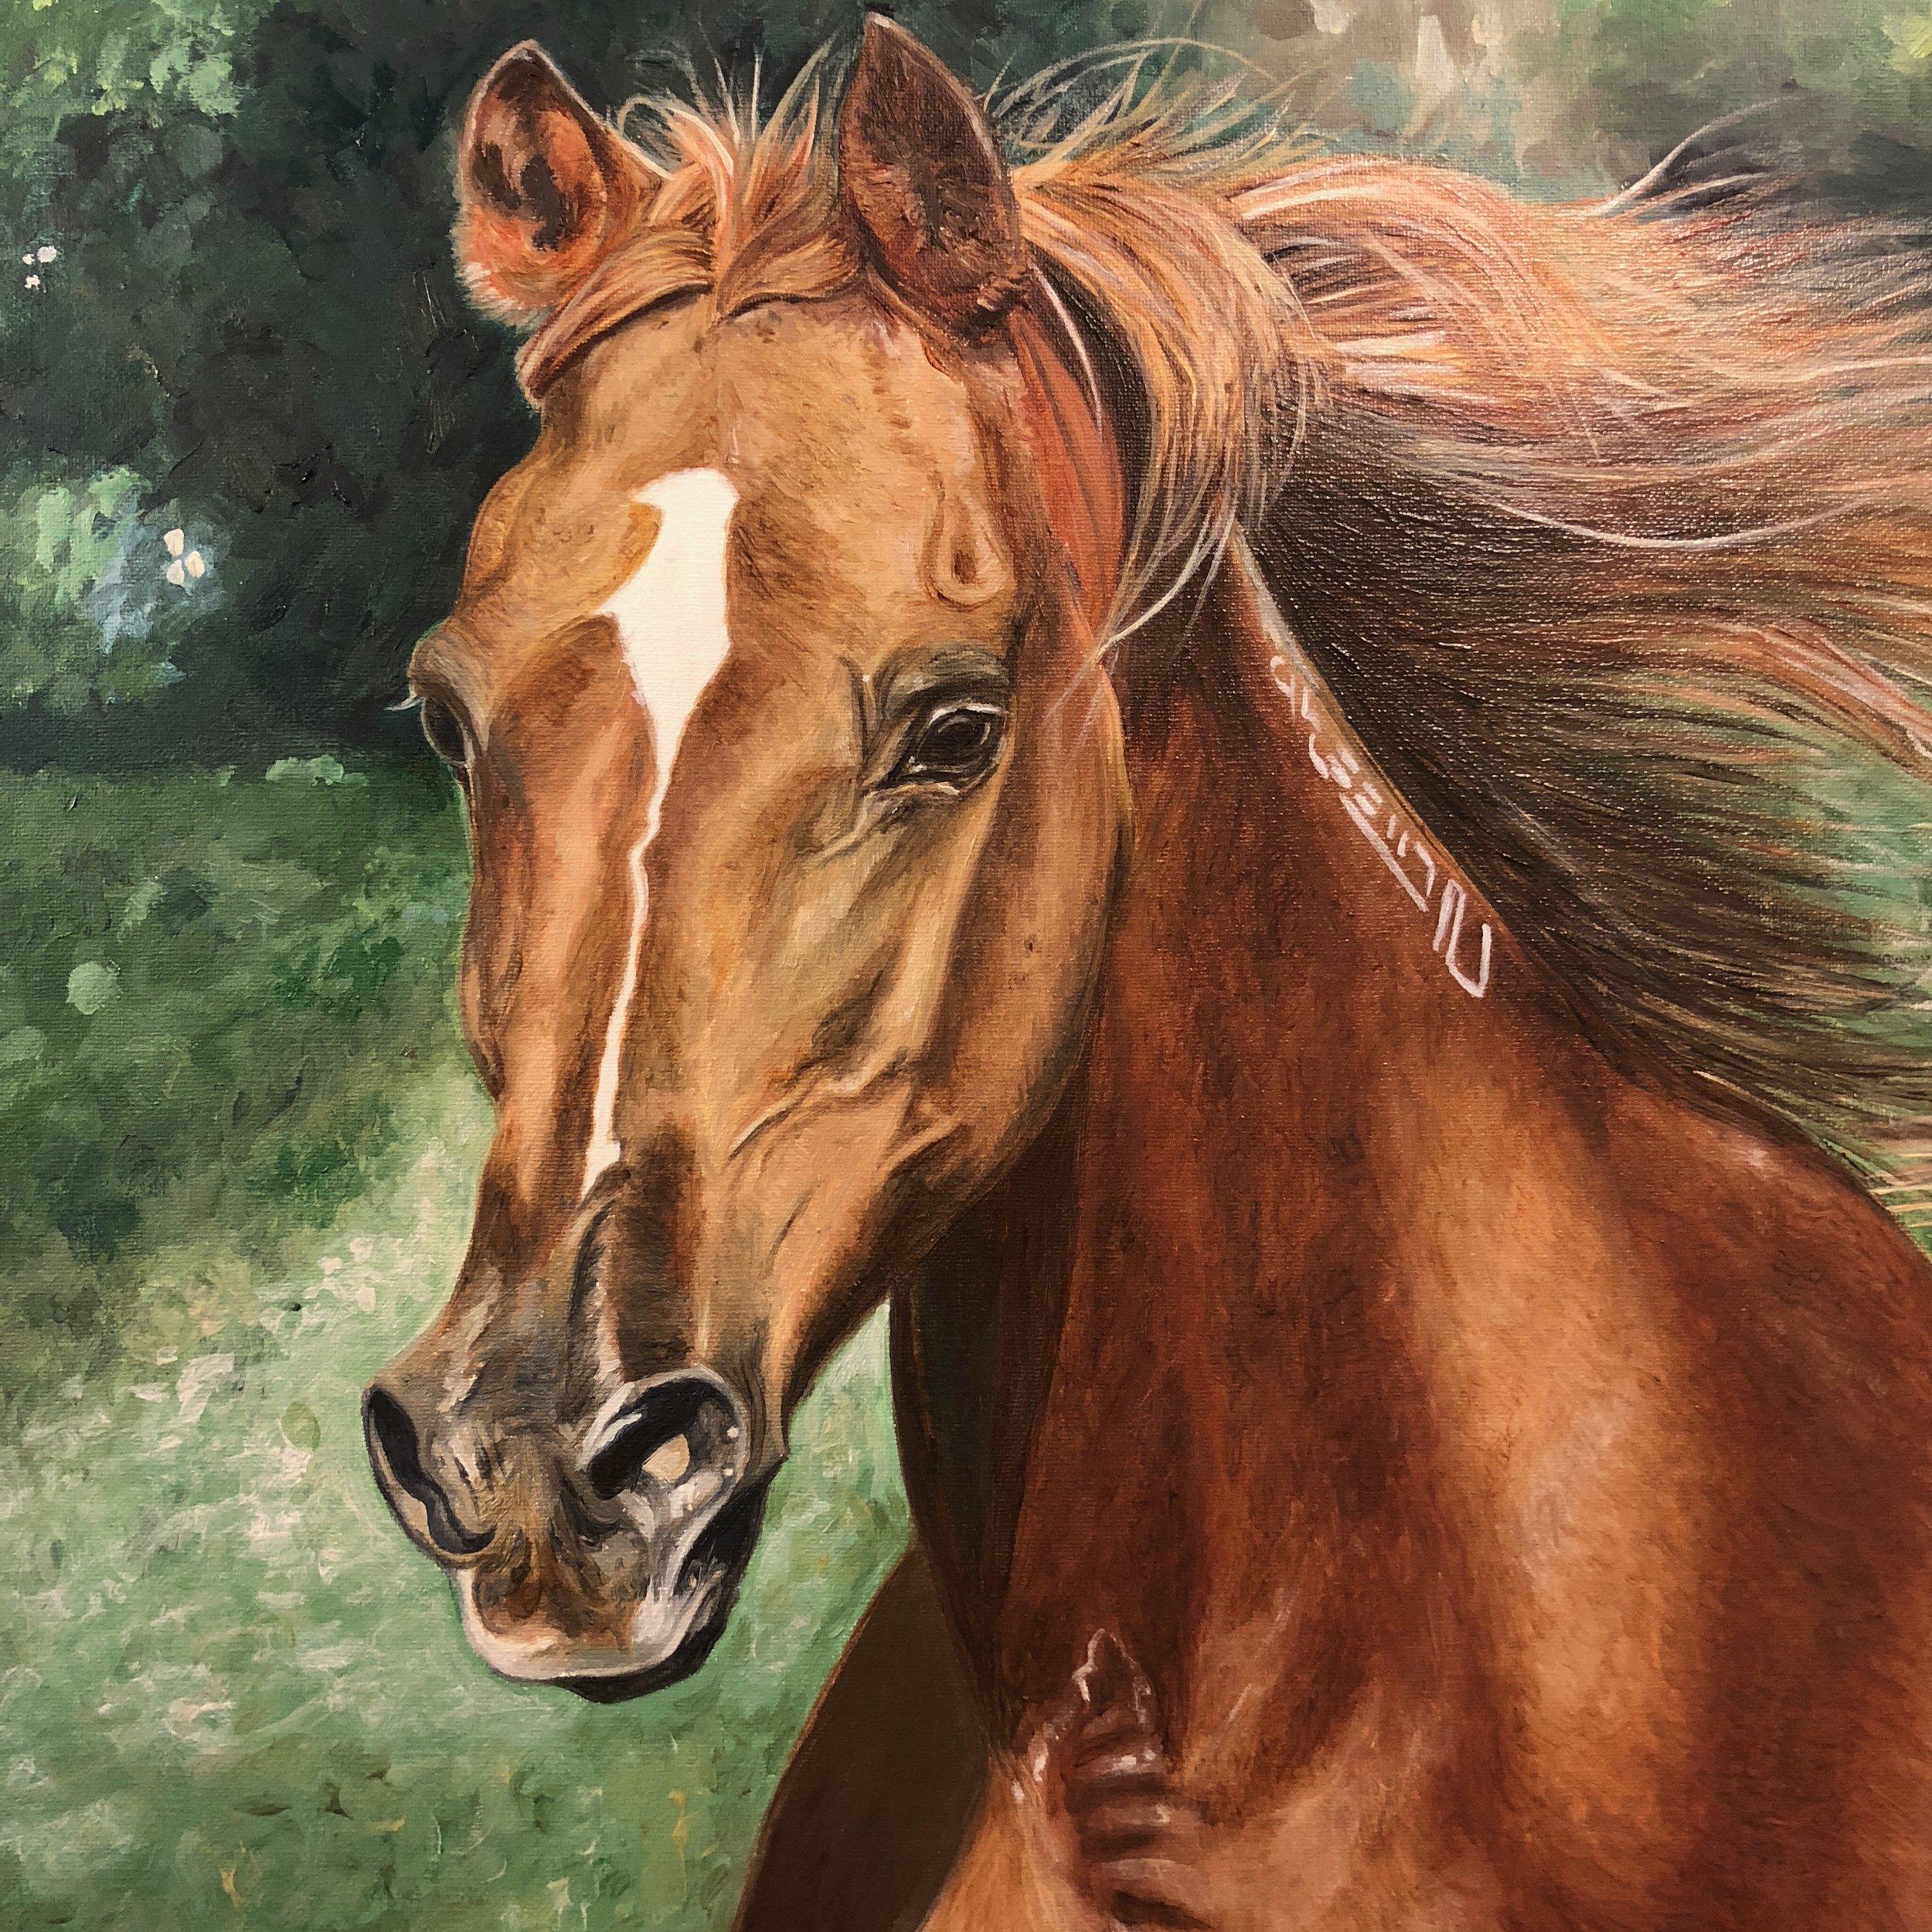 Arabian Horse Art | Paint Horse | Horse Paintings on Canvas